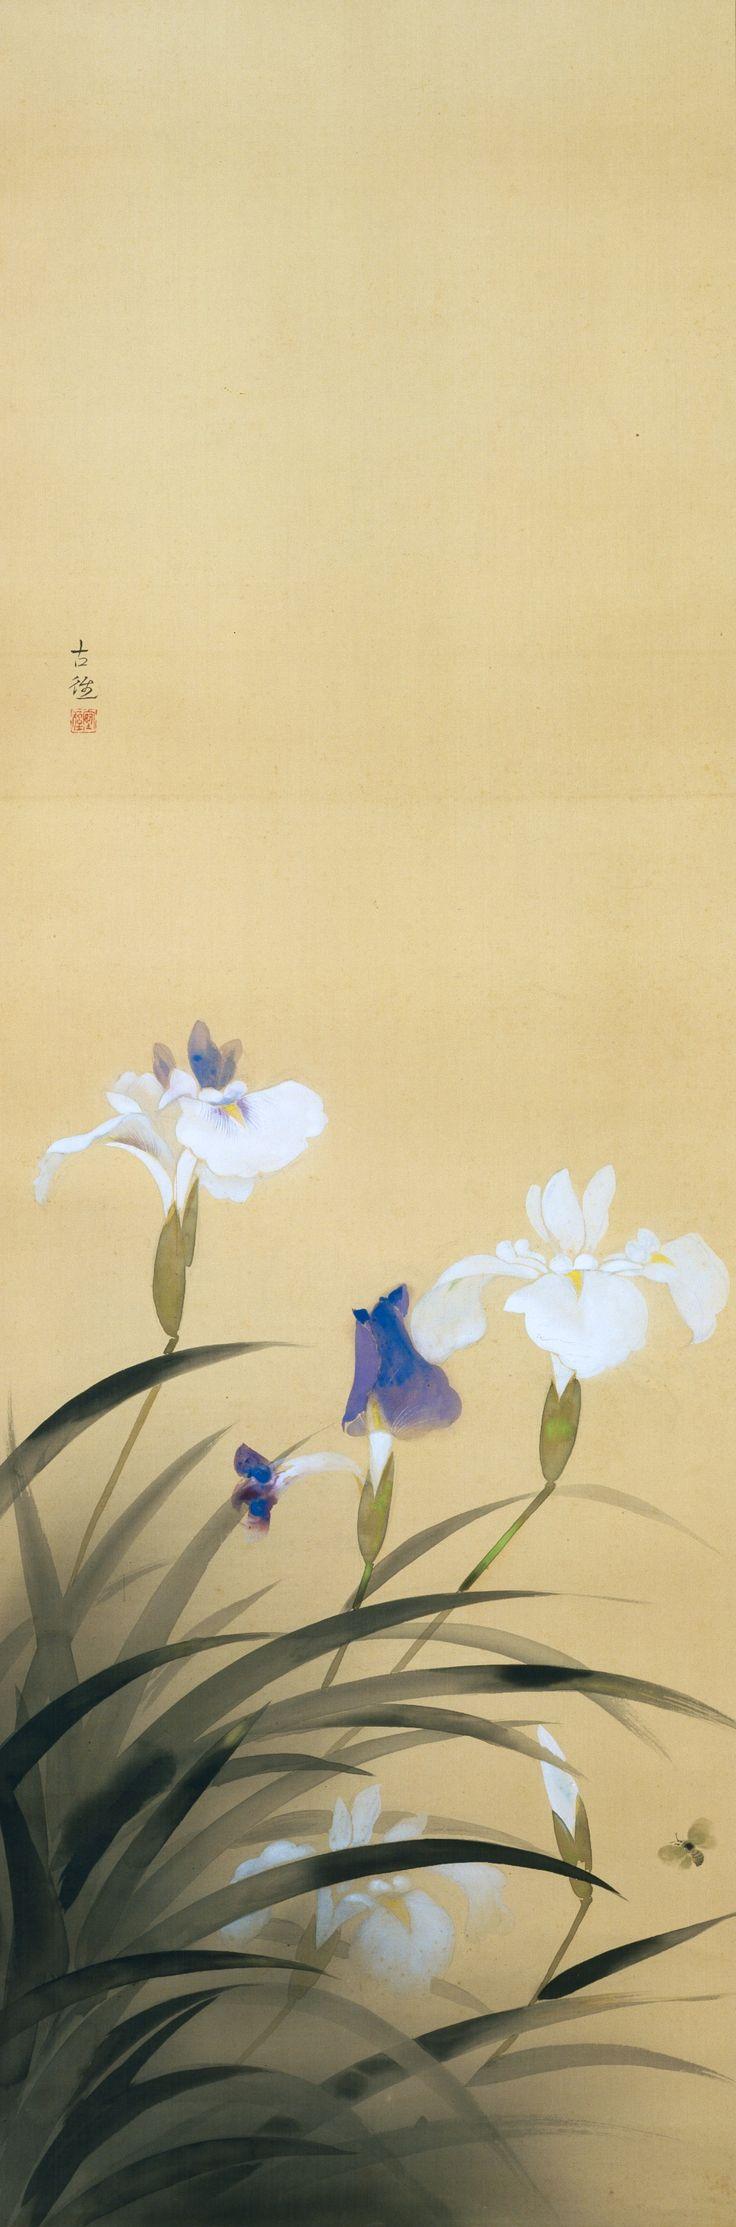 Iris Laevigata c. 1935 Color on silk, hanging scroll 126.0 x 41.5 cm ARTIST: Kobayashi Kokei (1883-1957)